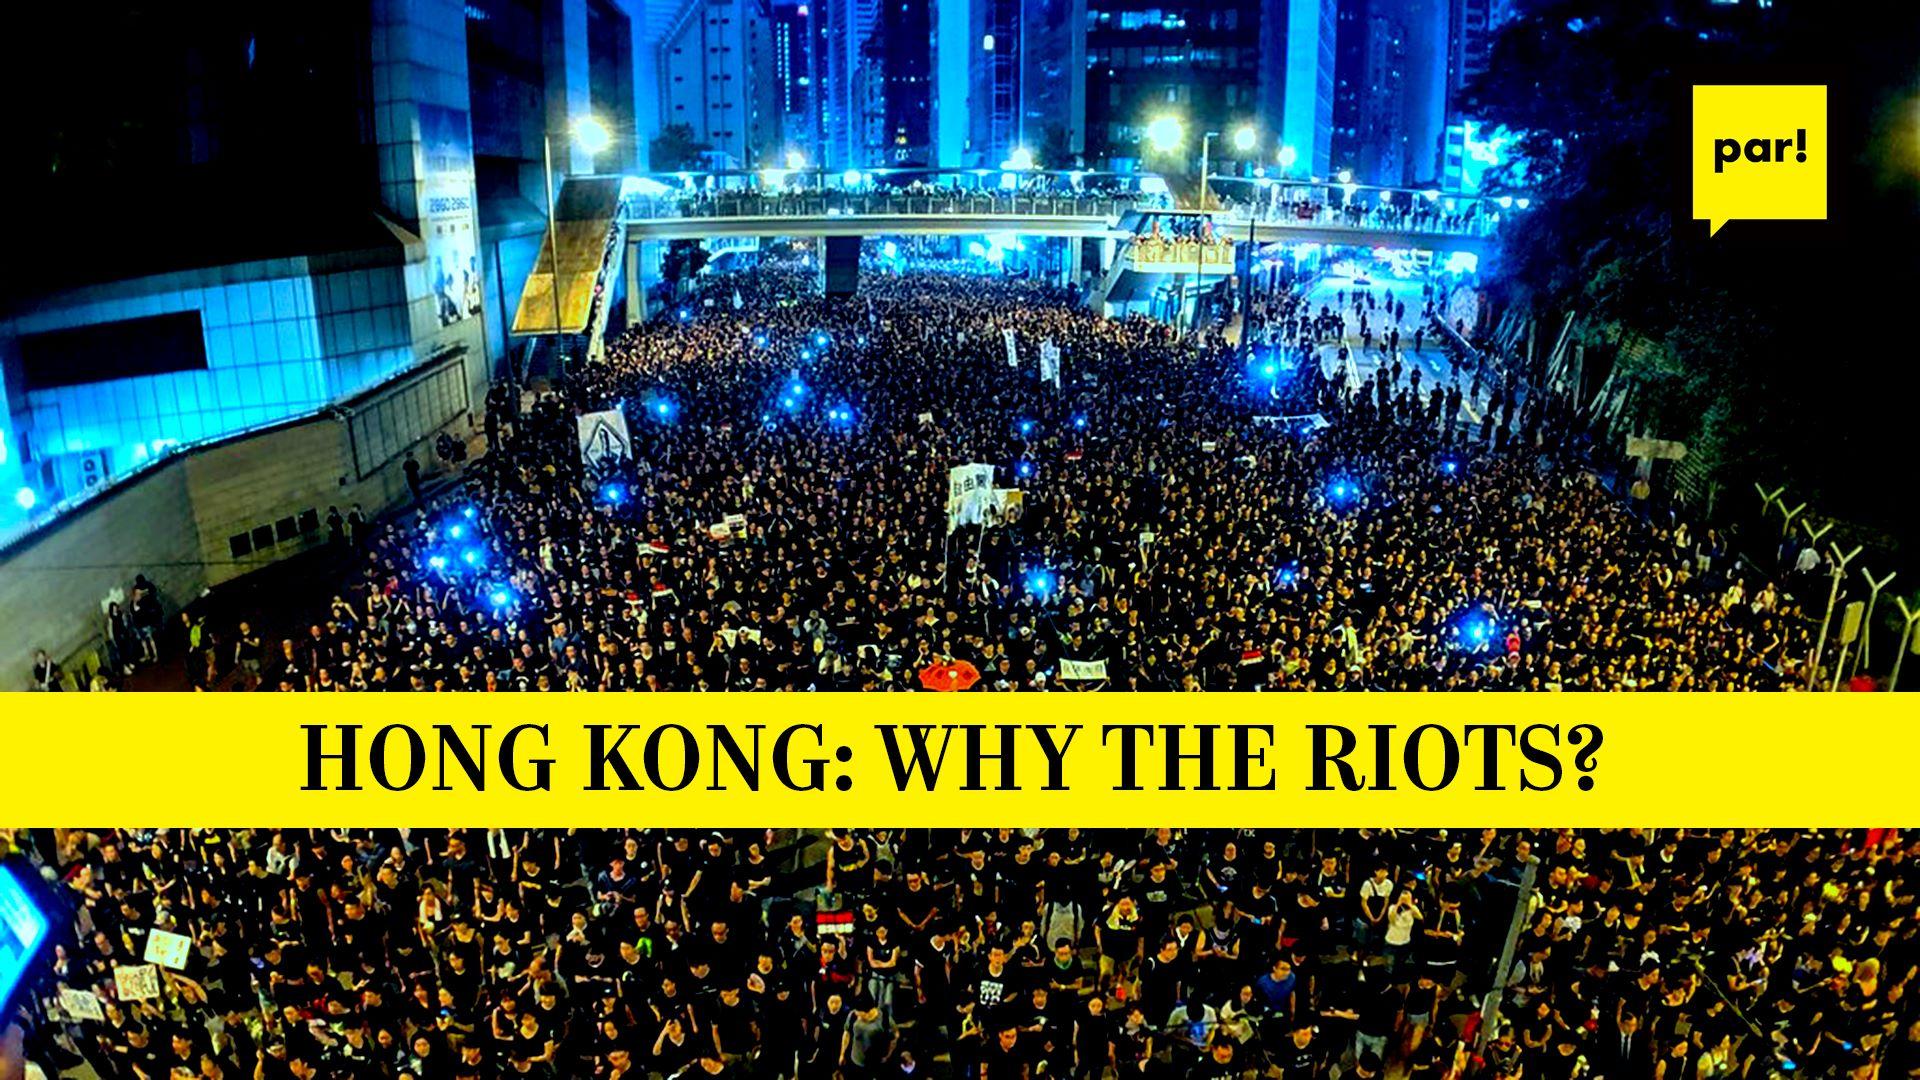 Hong Kong: why the riots? // Saruna angļu valodā 15.07.19.